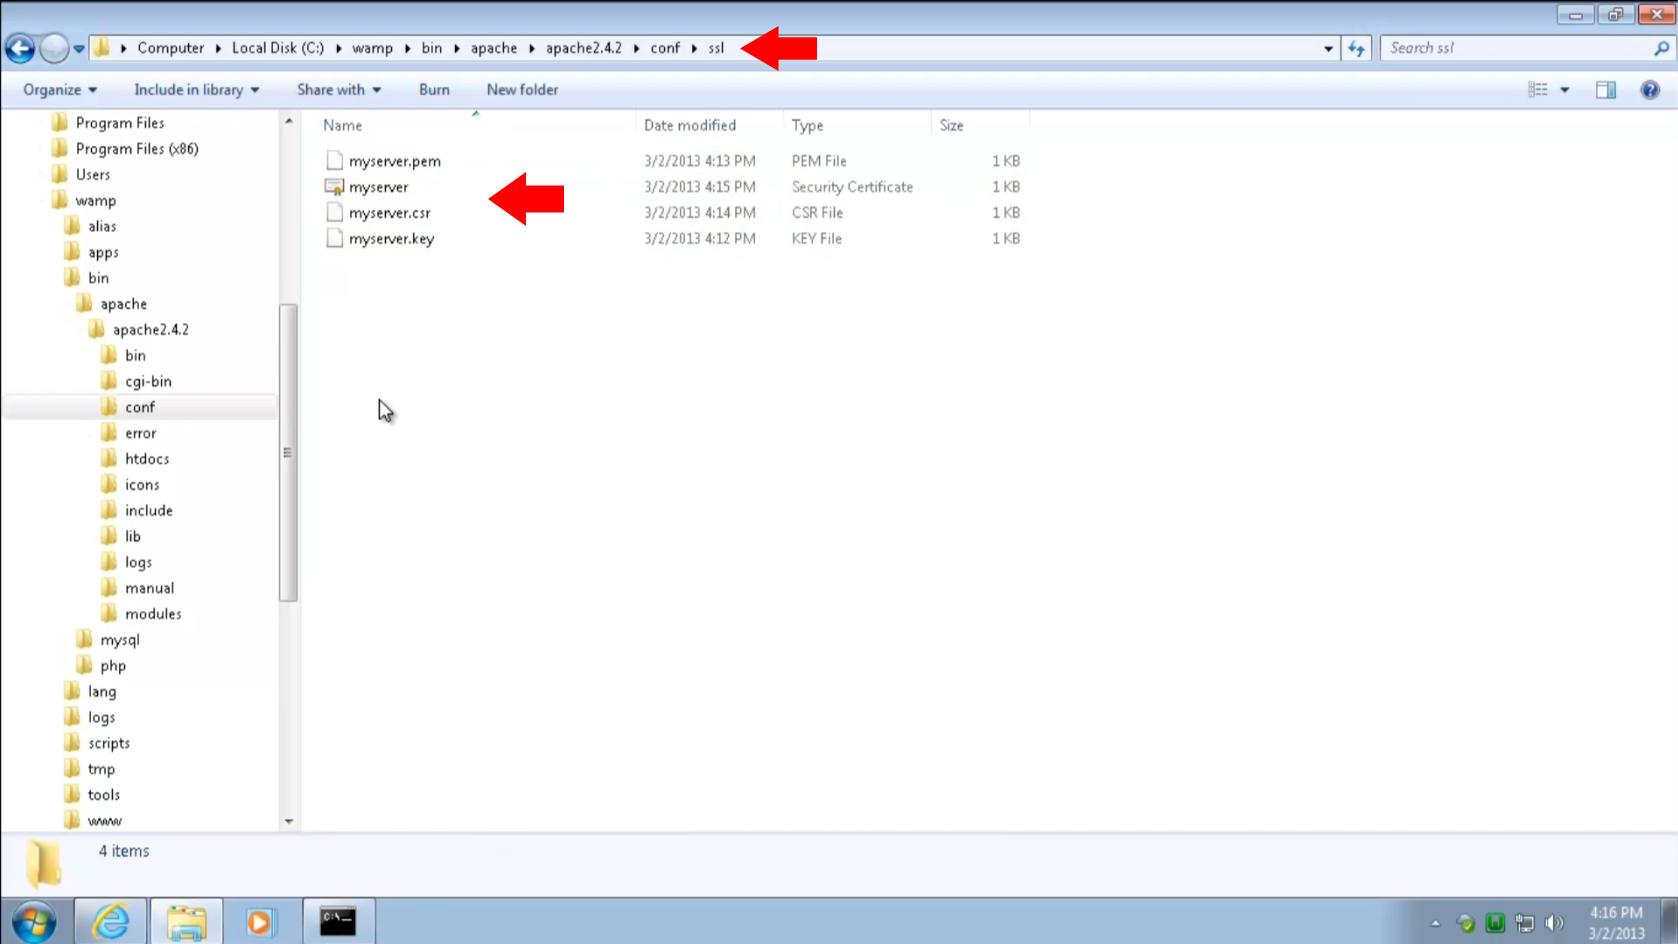 Install and configure owncloud server on windows 7 using wamp 5 move keys to ssl folder 1betcityfo Choice Image